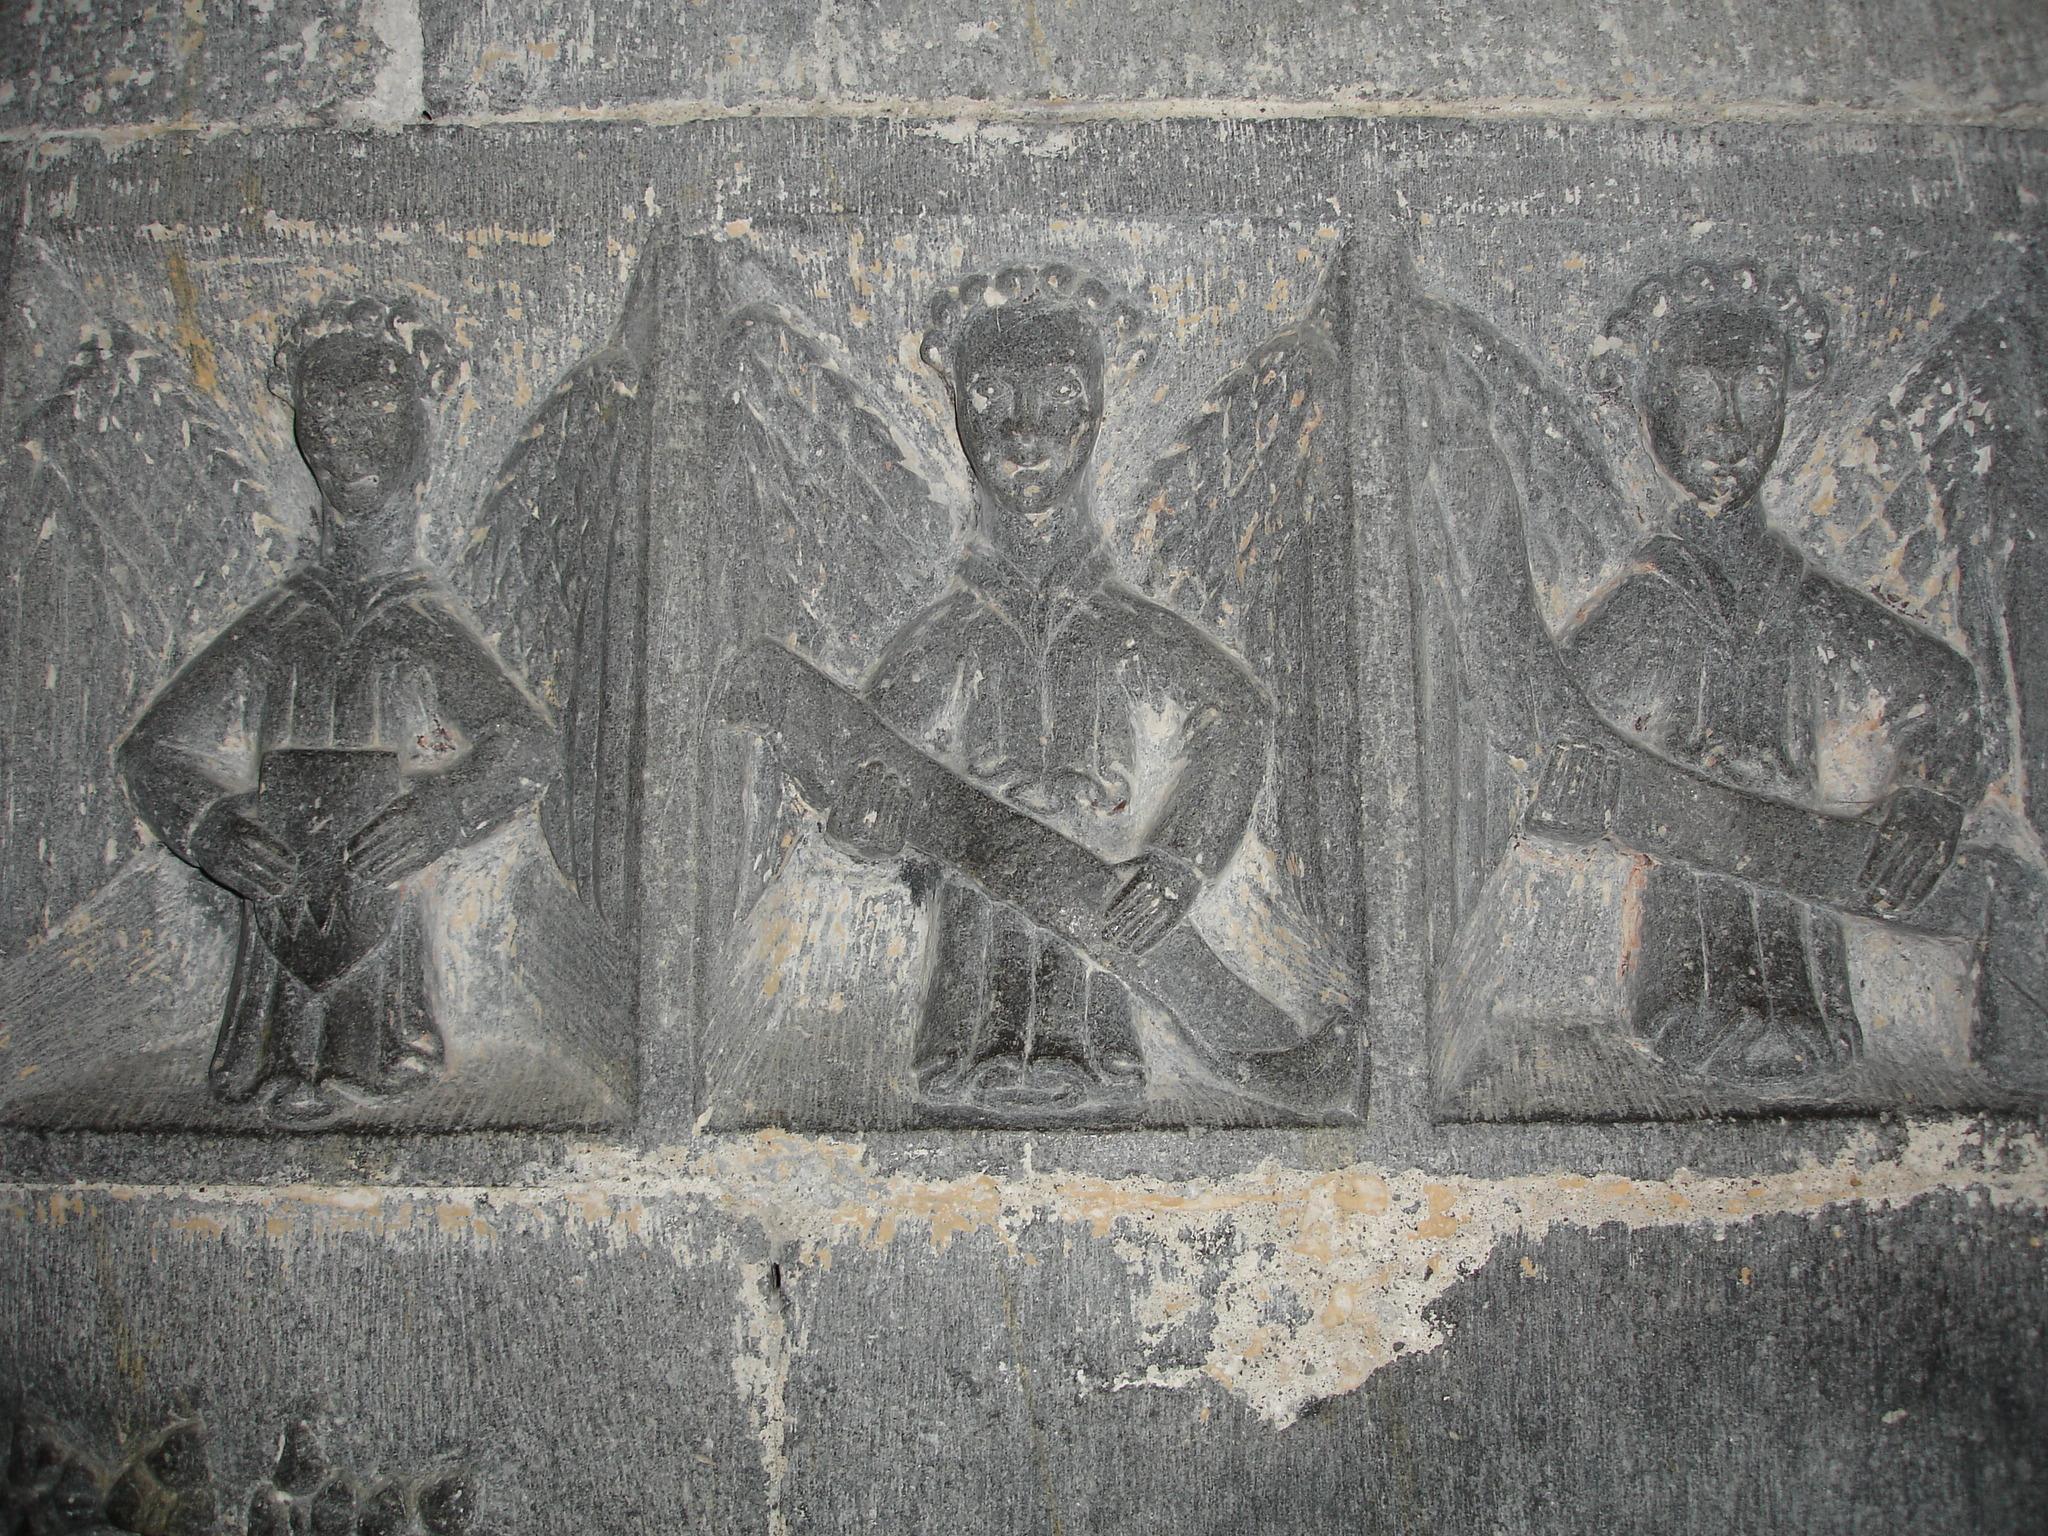 Clonfert Cathedral Ireland File:clonfert Cathedral Detail